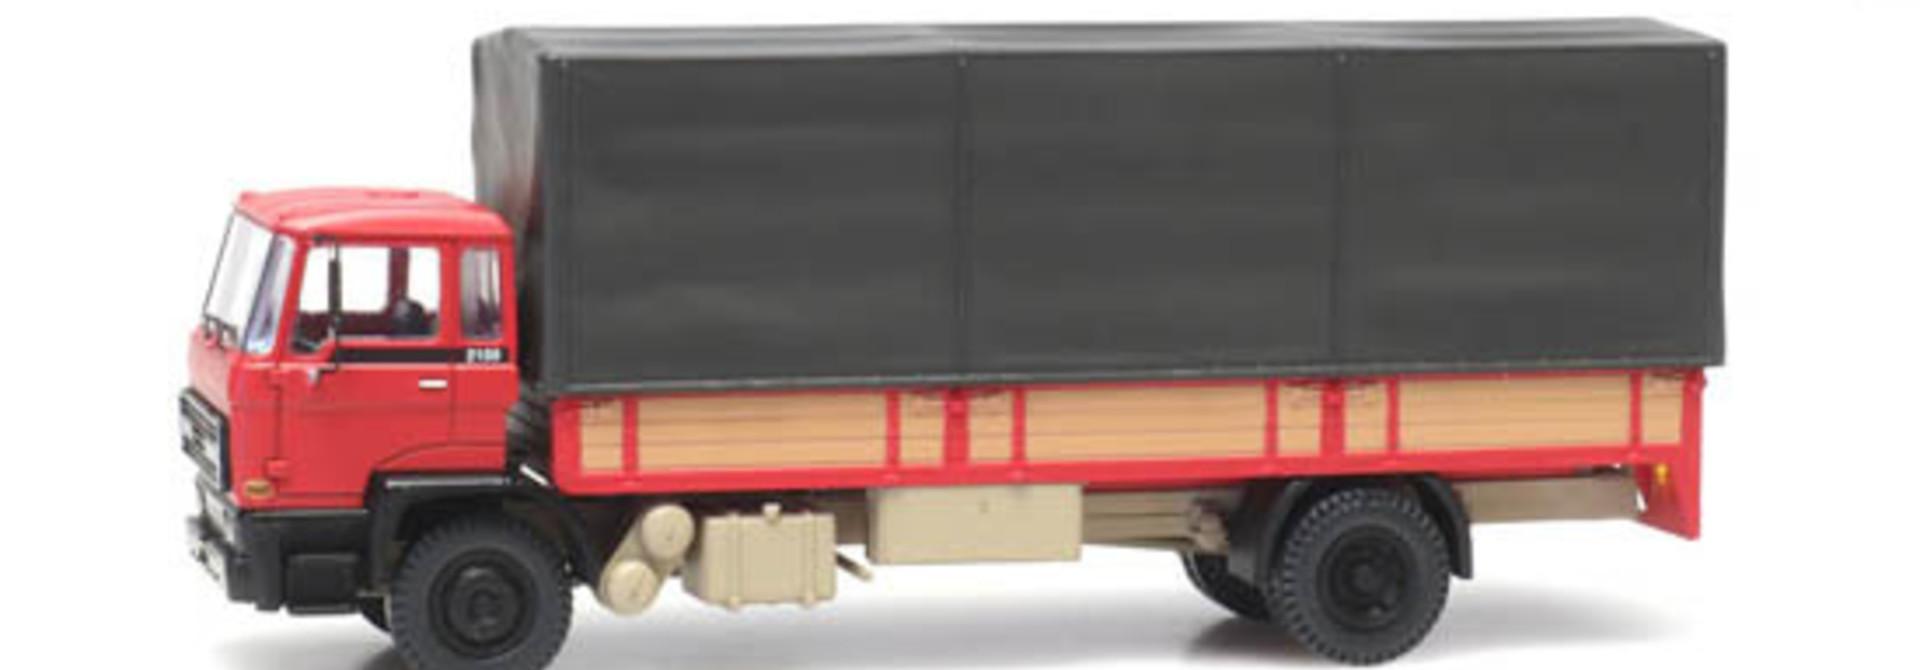 487.052.02 - DAF kantelcabine 1982, open bak, huif, rood